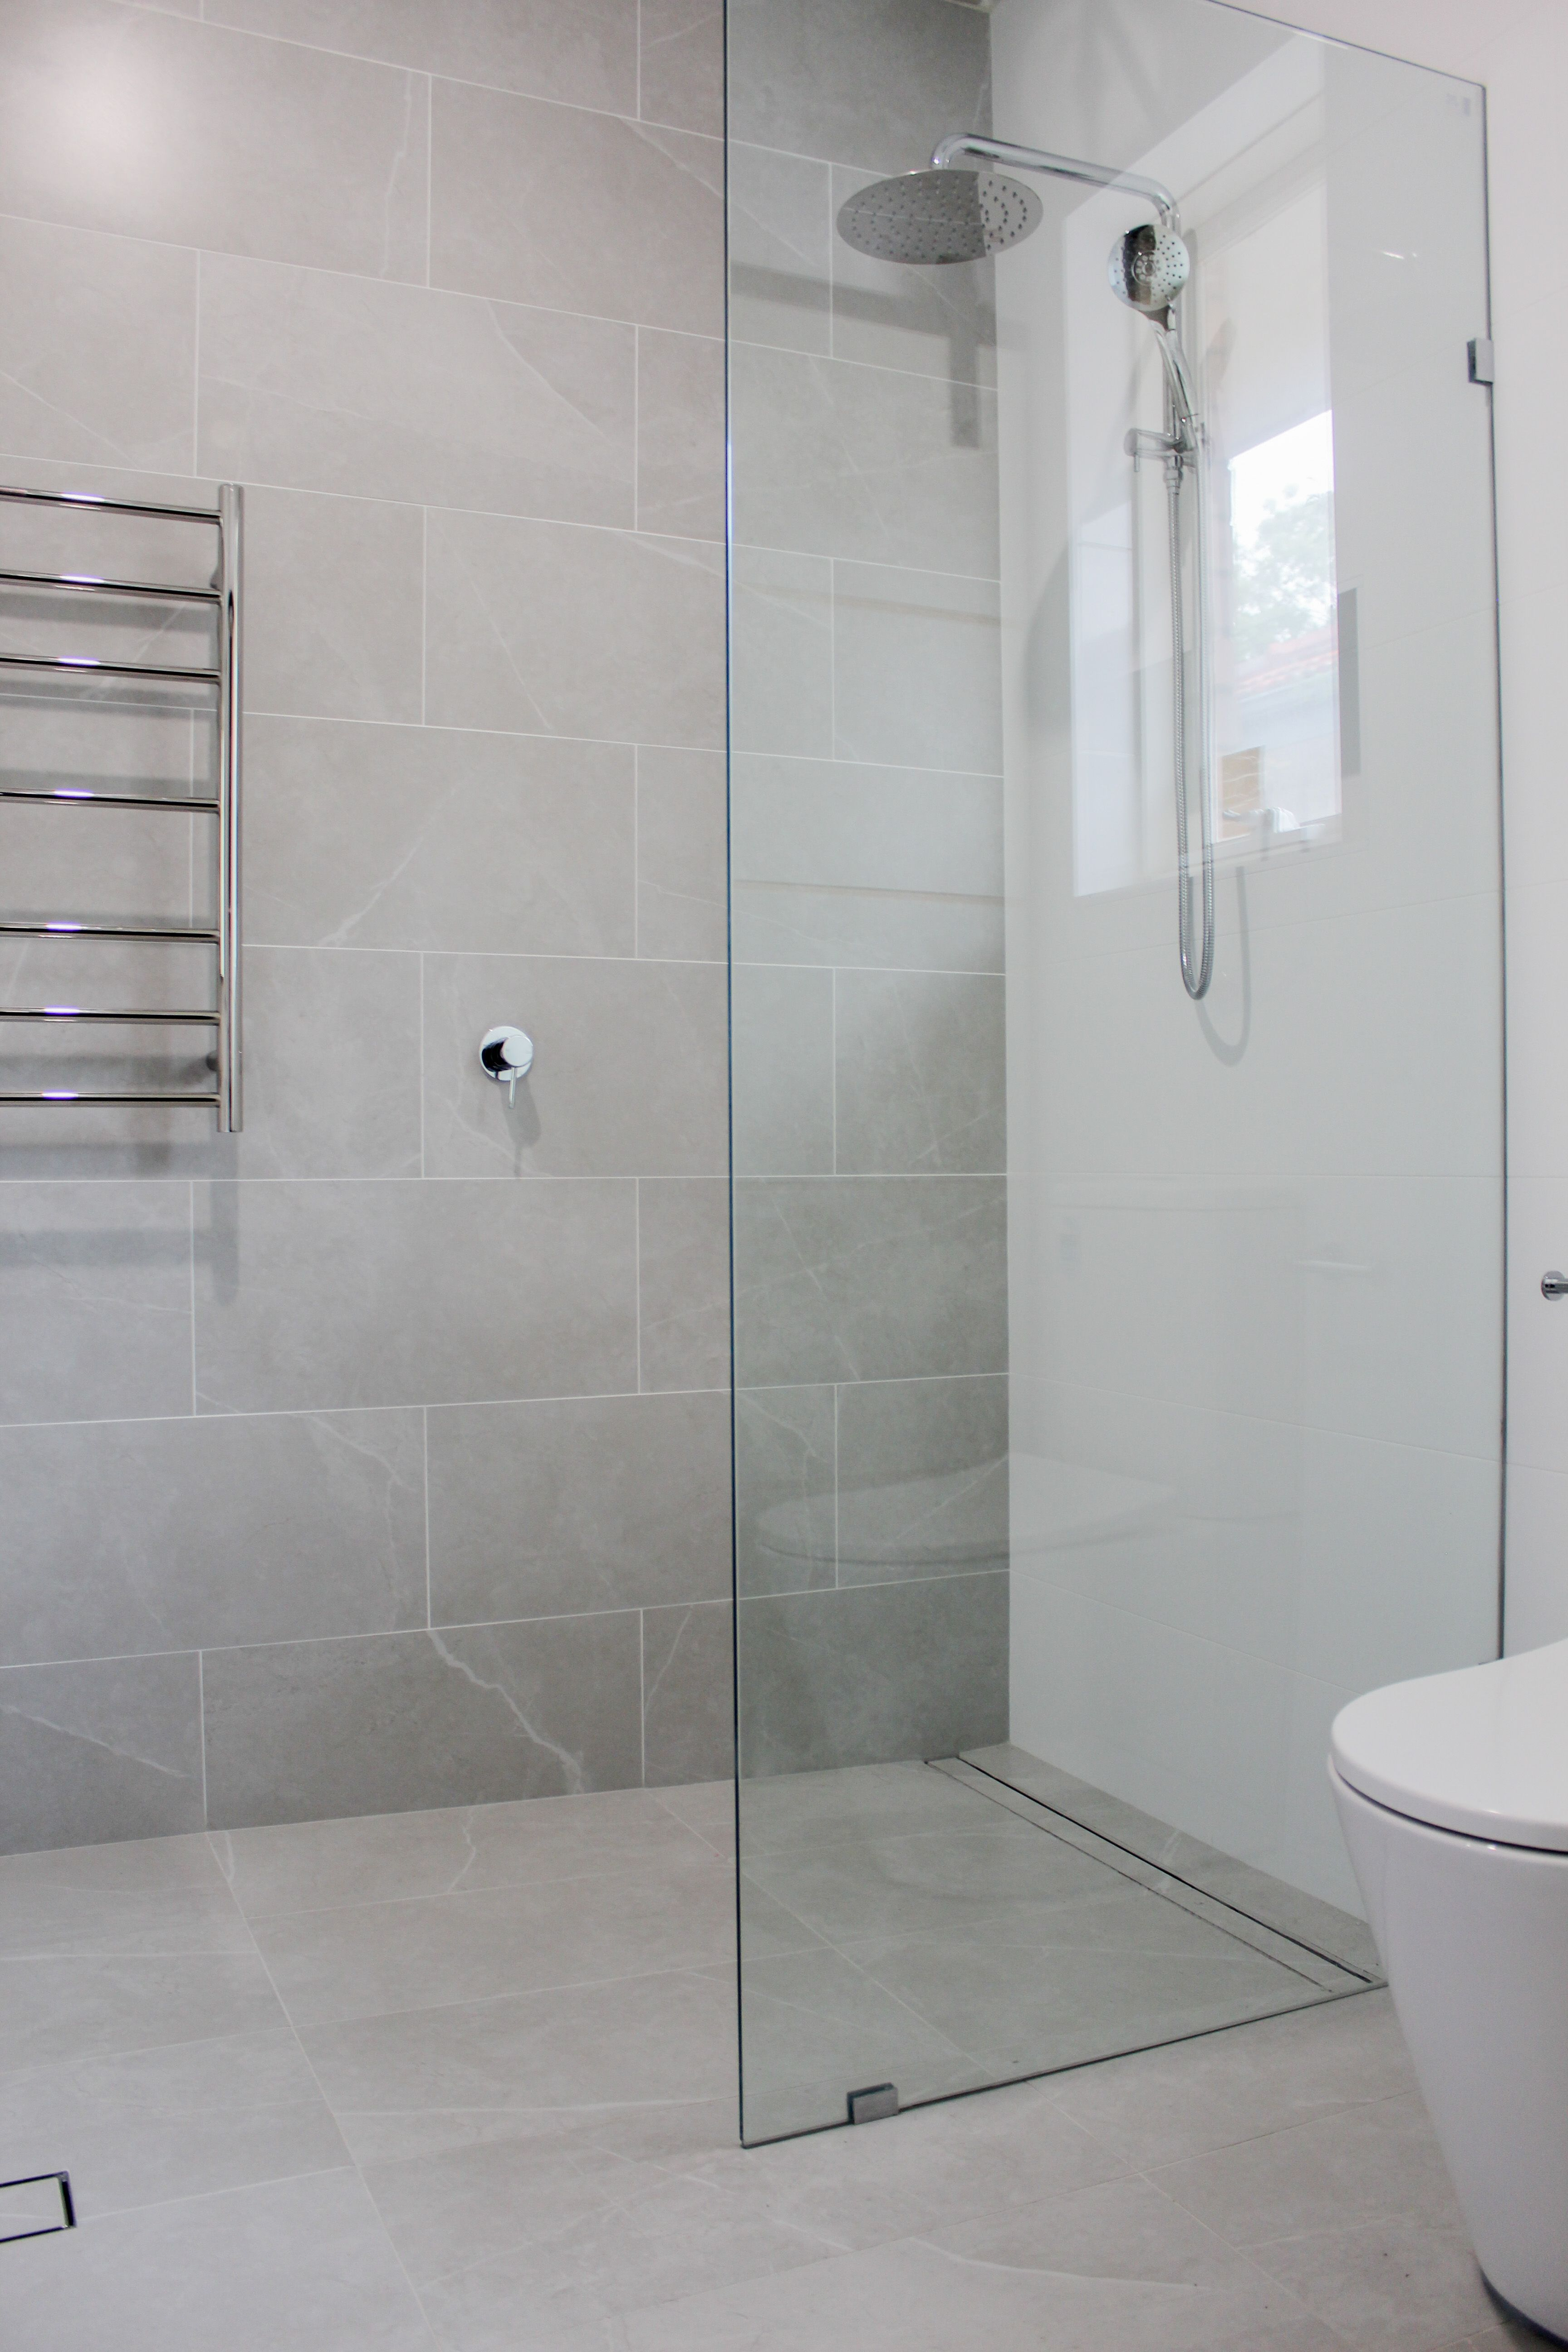 Brick Fashion Feature Wall Shaker Vanity Walk In Shower Wet Room Set Up In 2020 Bathroom Remodel Pictures Bathroom Renovations Perth Bathroom Renovations